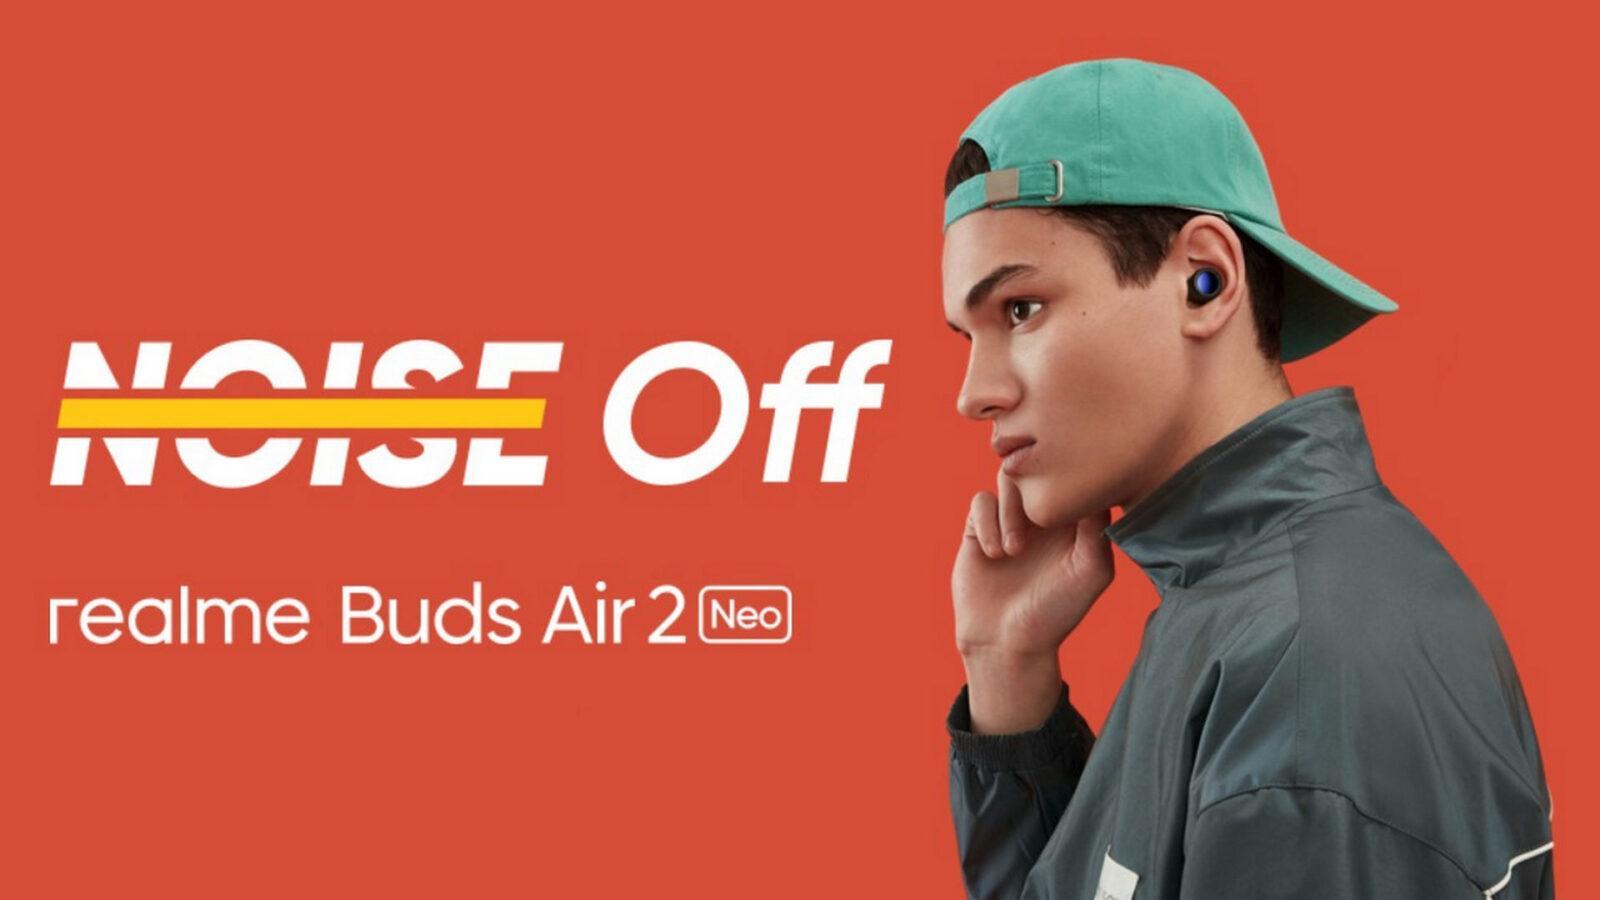 Realme представила в России беспроводные наушники Realme Buds Air 2 Neo